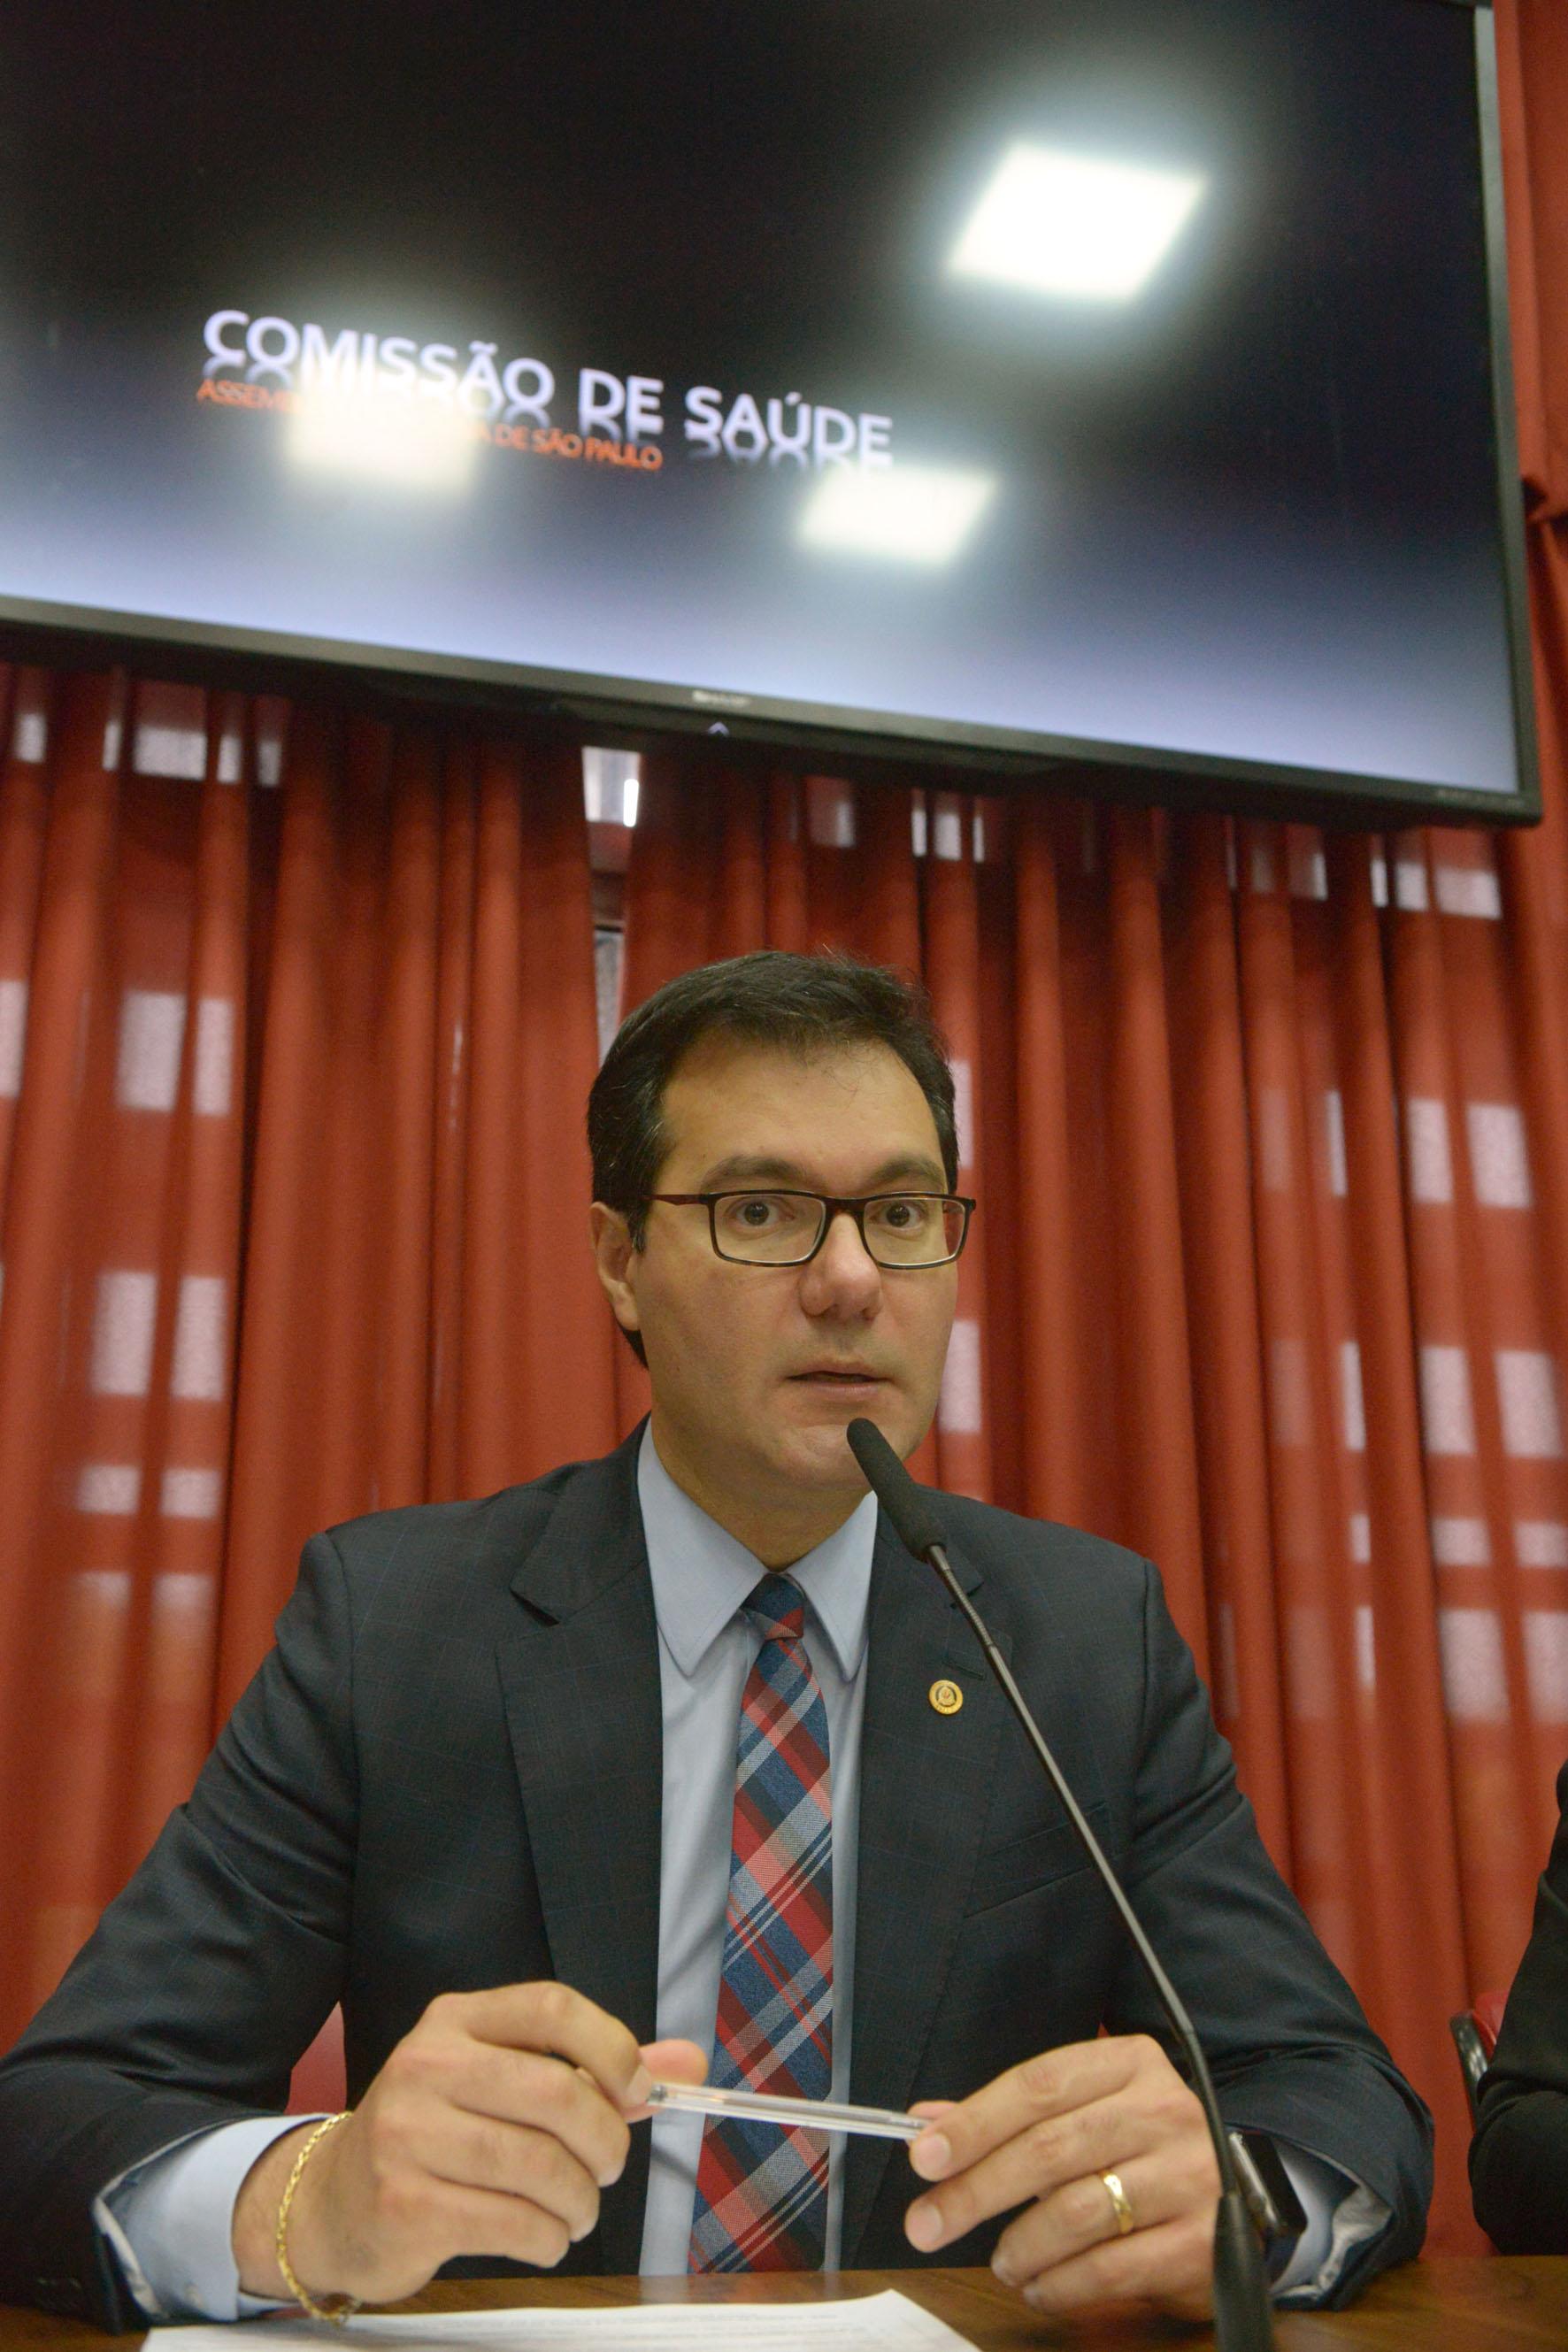 Alex de Madureira preside a comissão<a style='float:right' href='https://www3.al.sp.gov.br/repositorio/noticia/N-10-2019/fg241475.jpg' target=_blank><img src='/_img/material-file-download-white.png' width='14px' alt='Clique para baixar a imagem'></a>